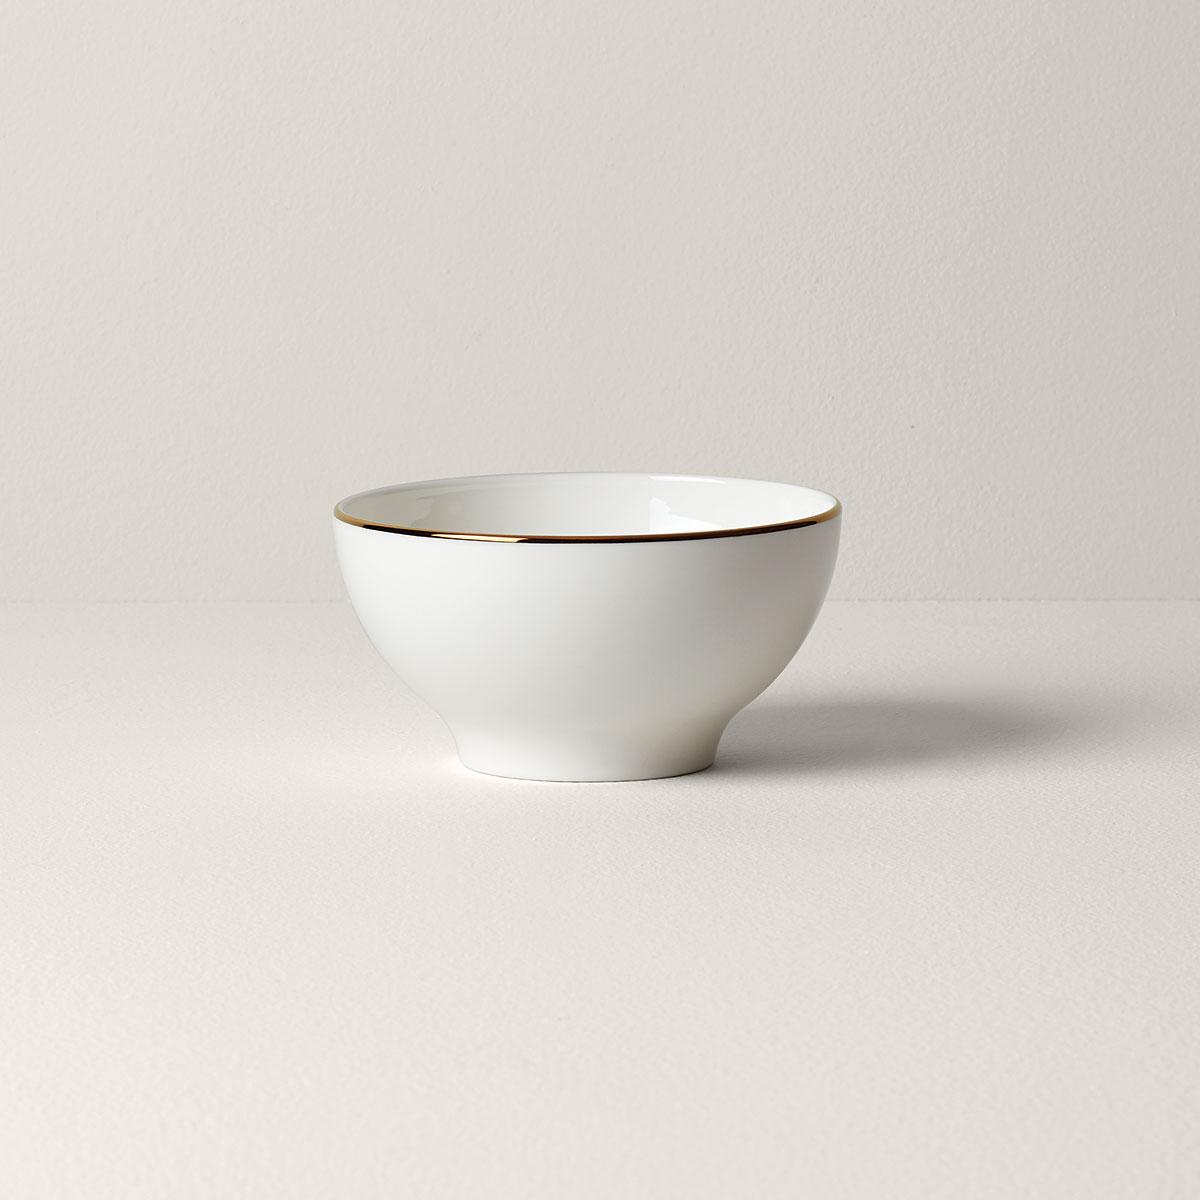 Lenox Continental Dining Gold Rice Bowl